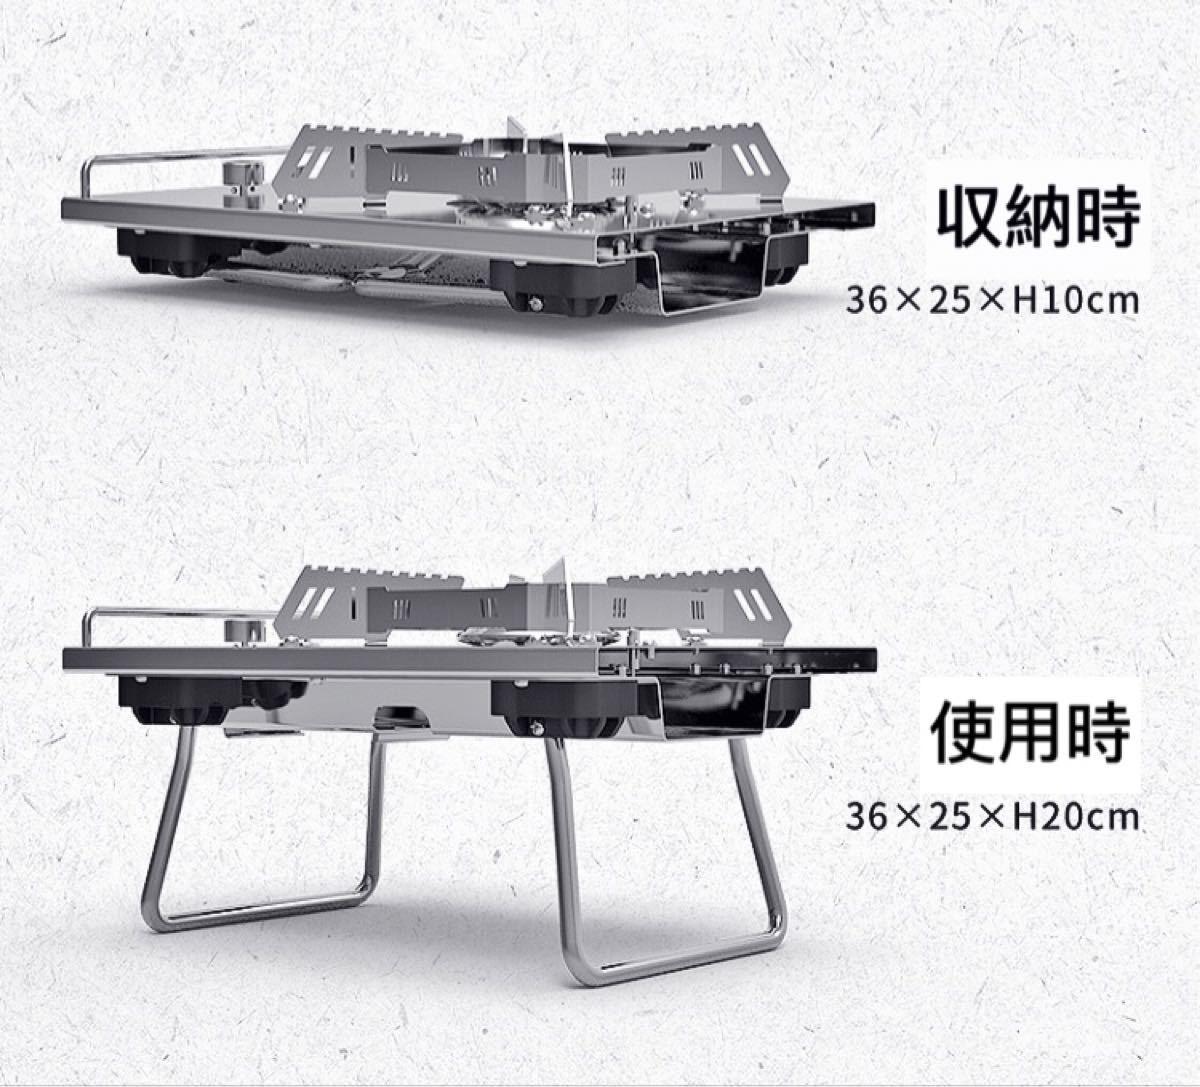 ALOCS  ハイパワーバーナー テーブル薄型 シングルバーナー 最大5500kw クッカースタンド アウトドア